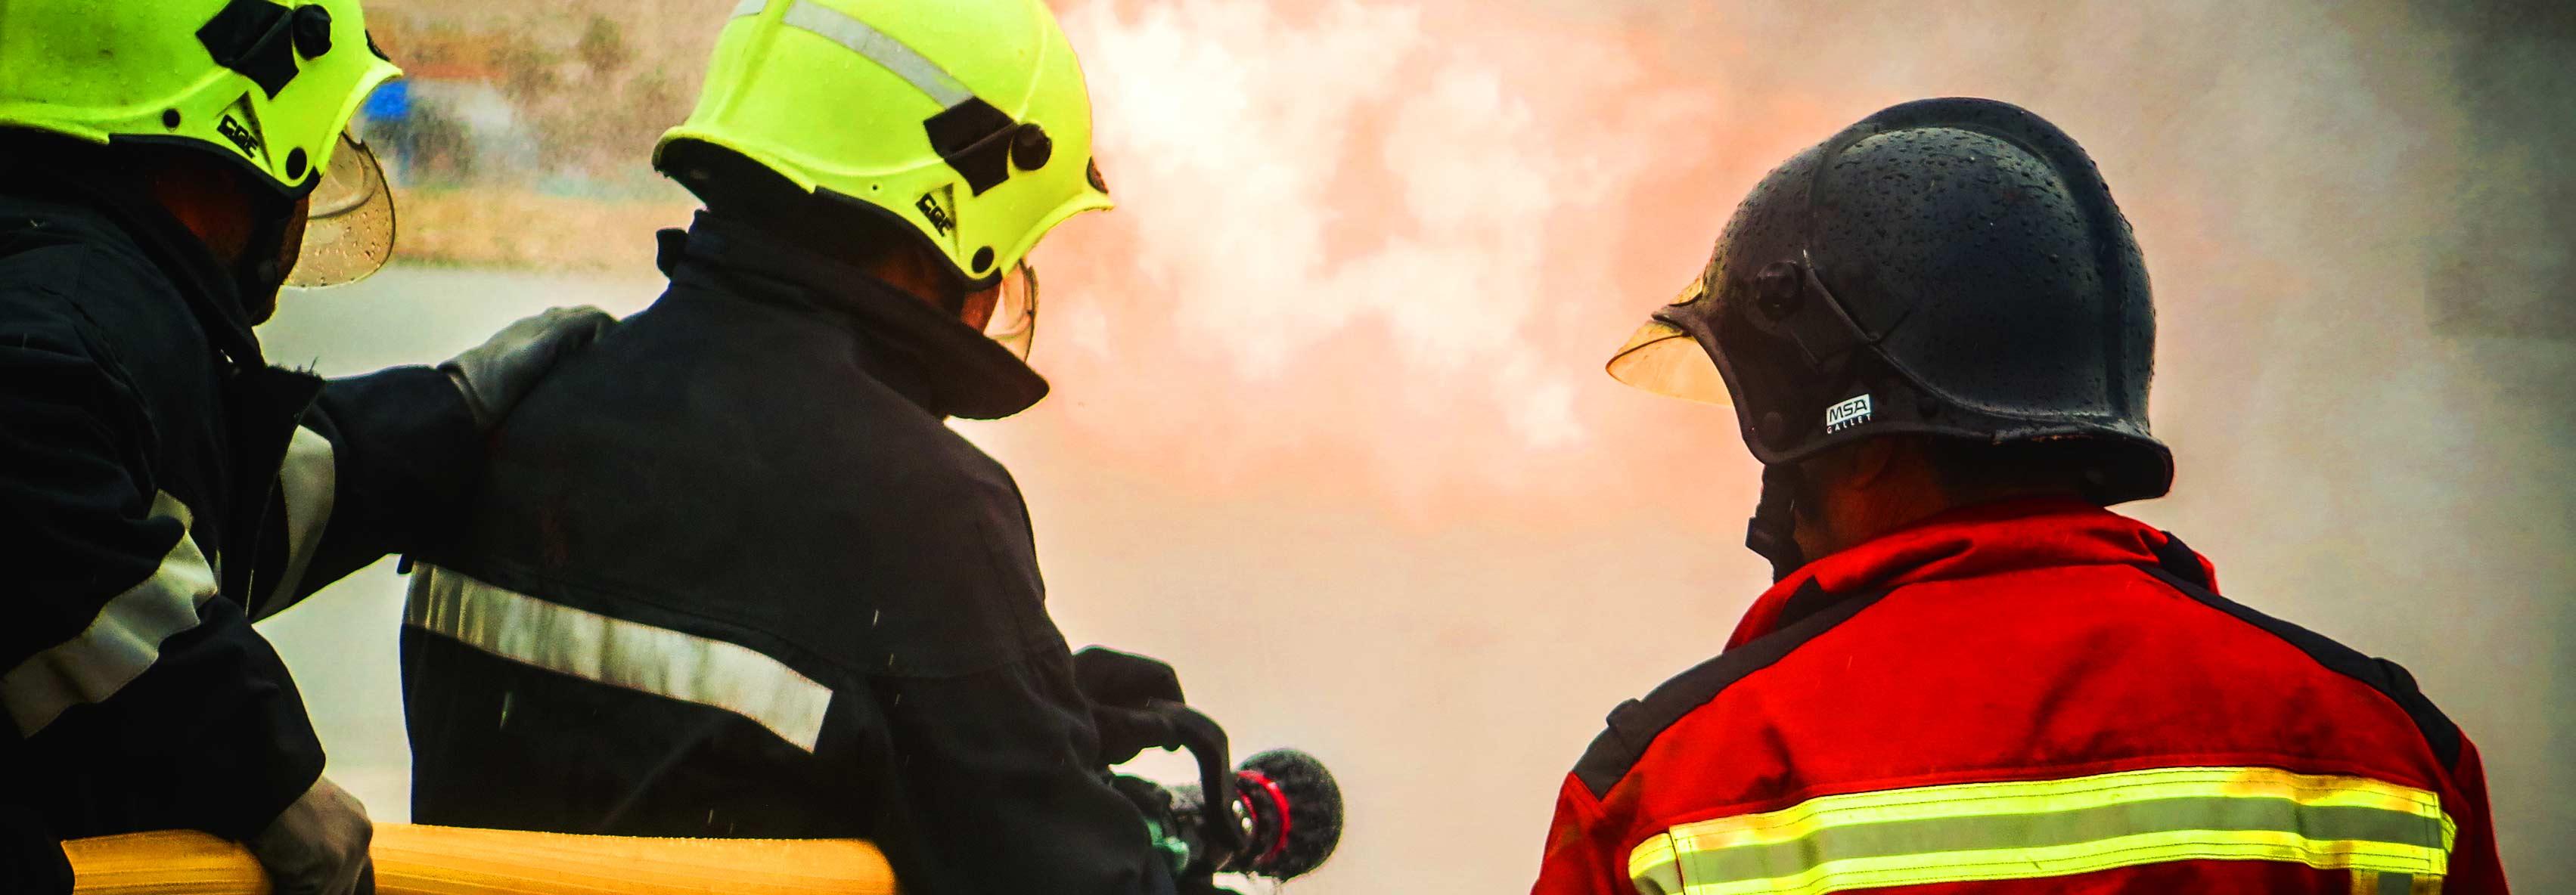 actualización avanzado lucha contra incendios